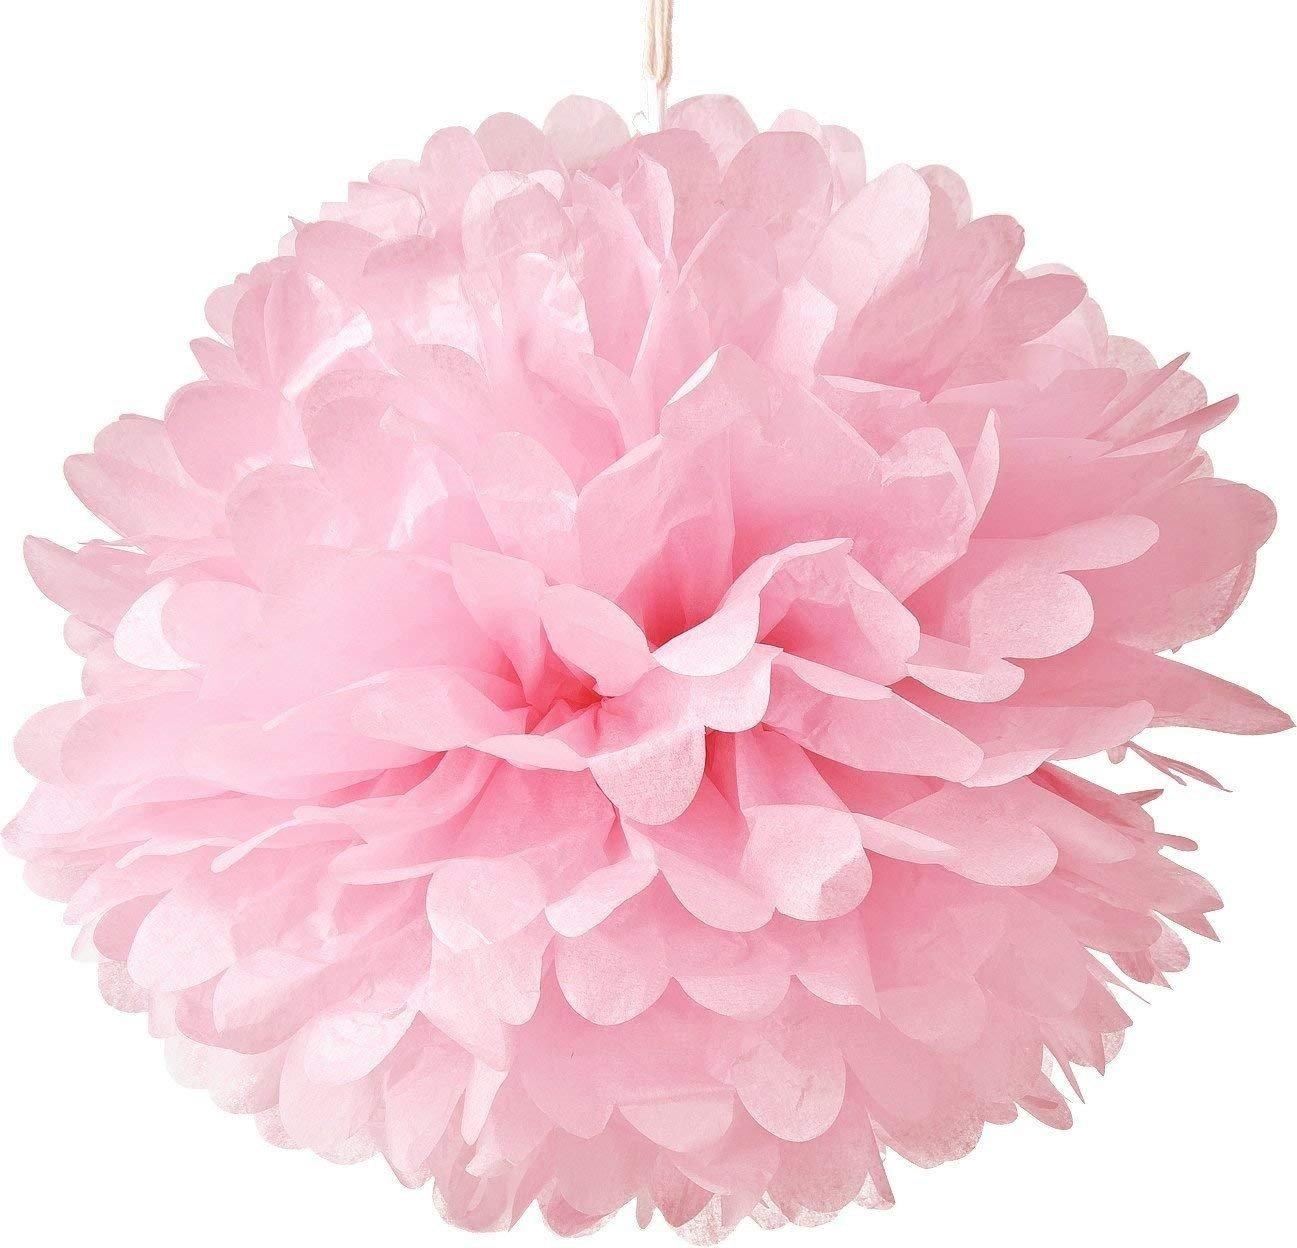 Amazon Hmxpls 10pcs Tissue Hanging Paper Pom Poms Flower Ball